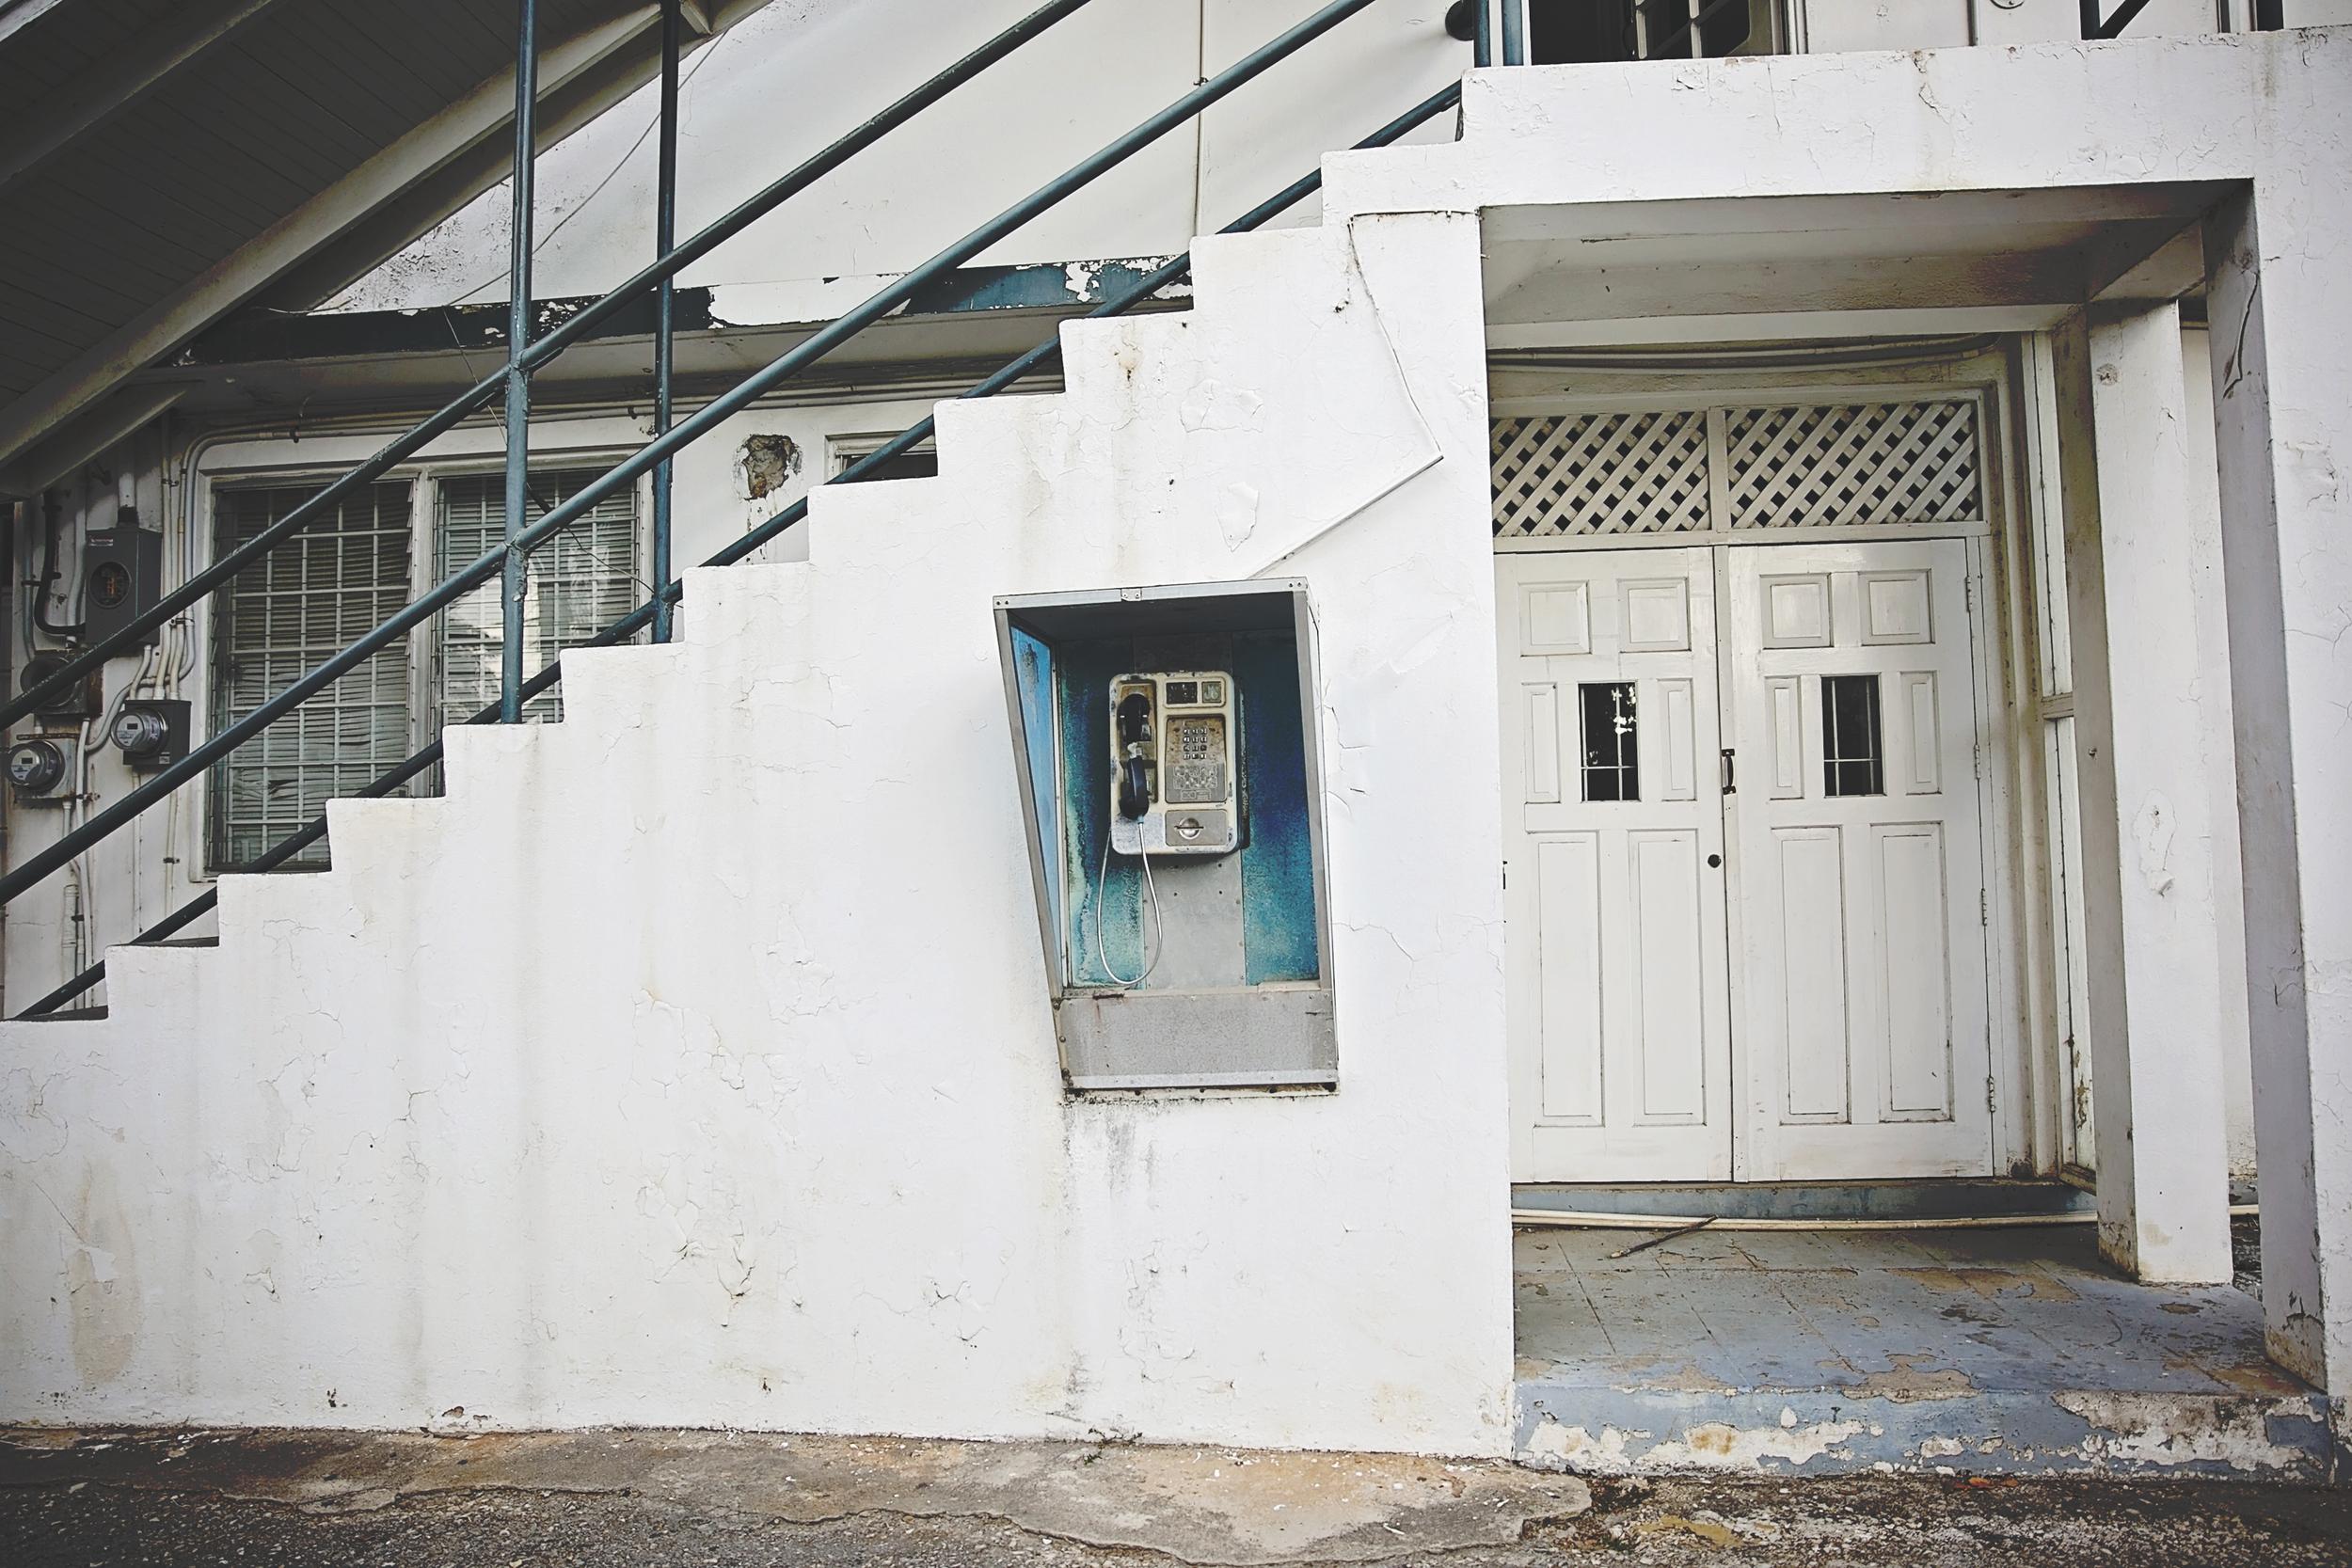 JamaicaPhonebooth.jpg